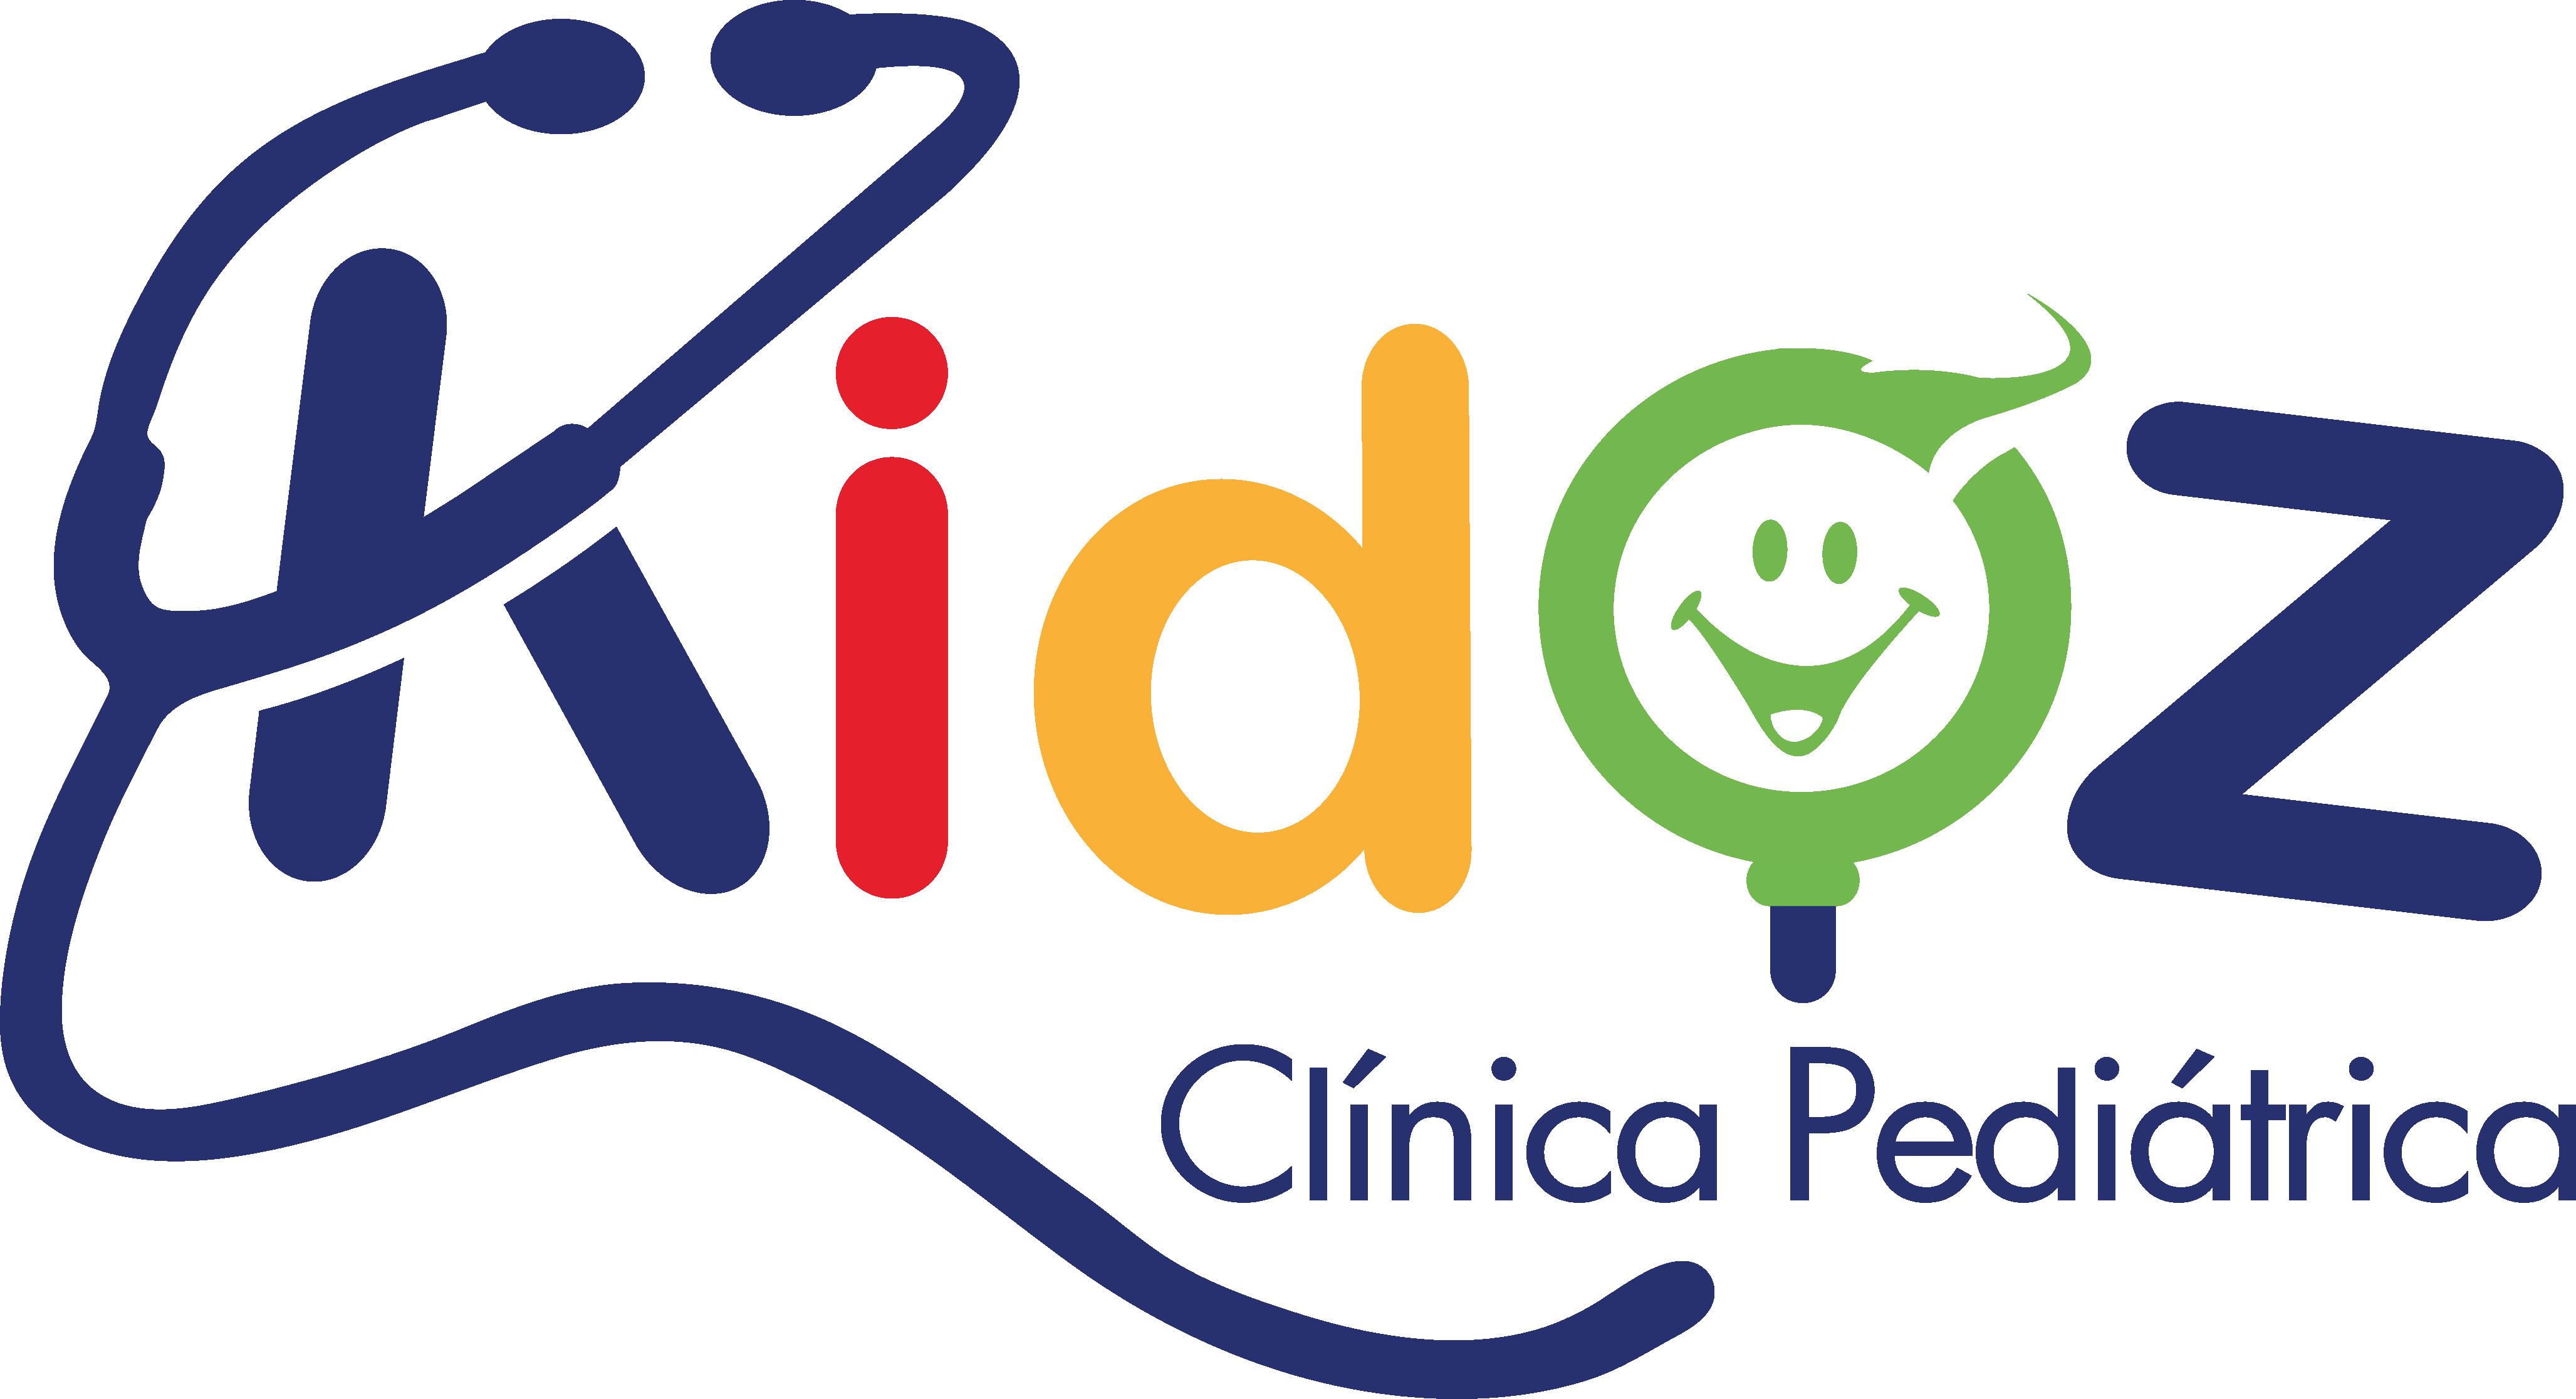 Logo Kidoz Digital